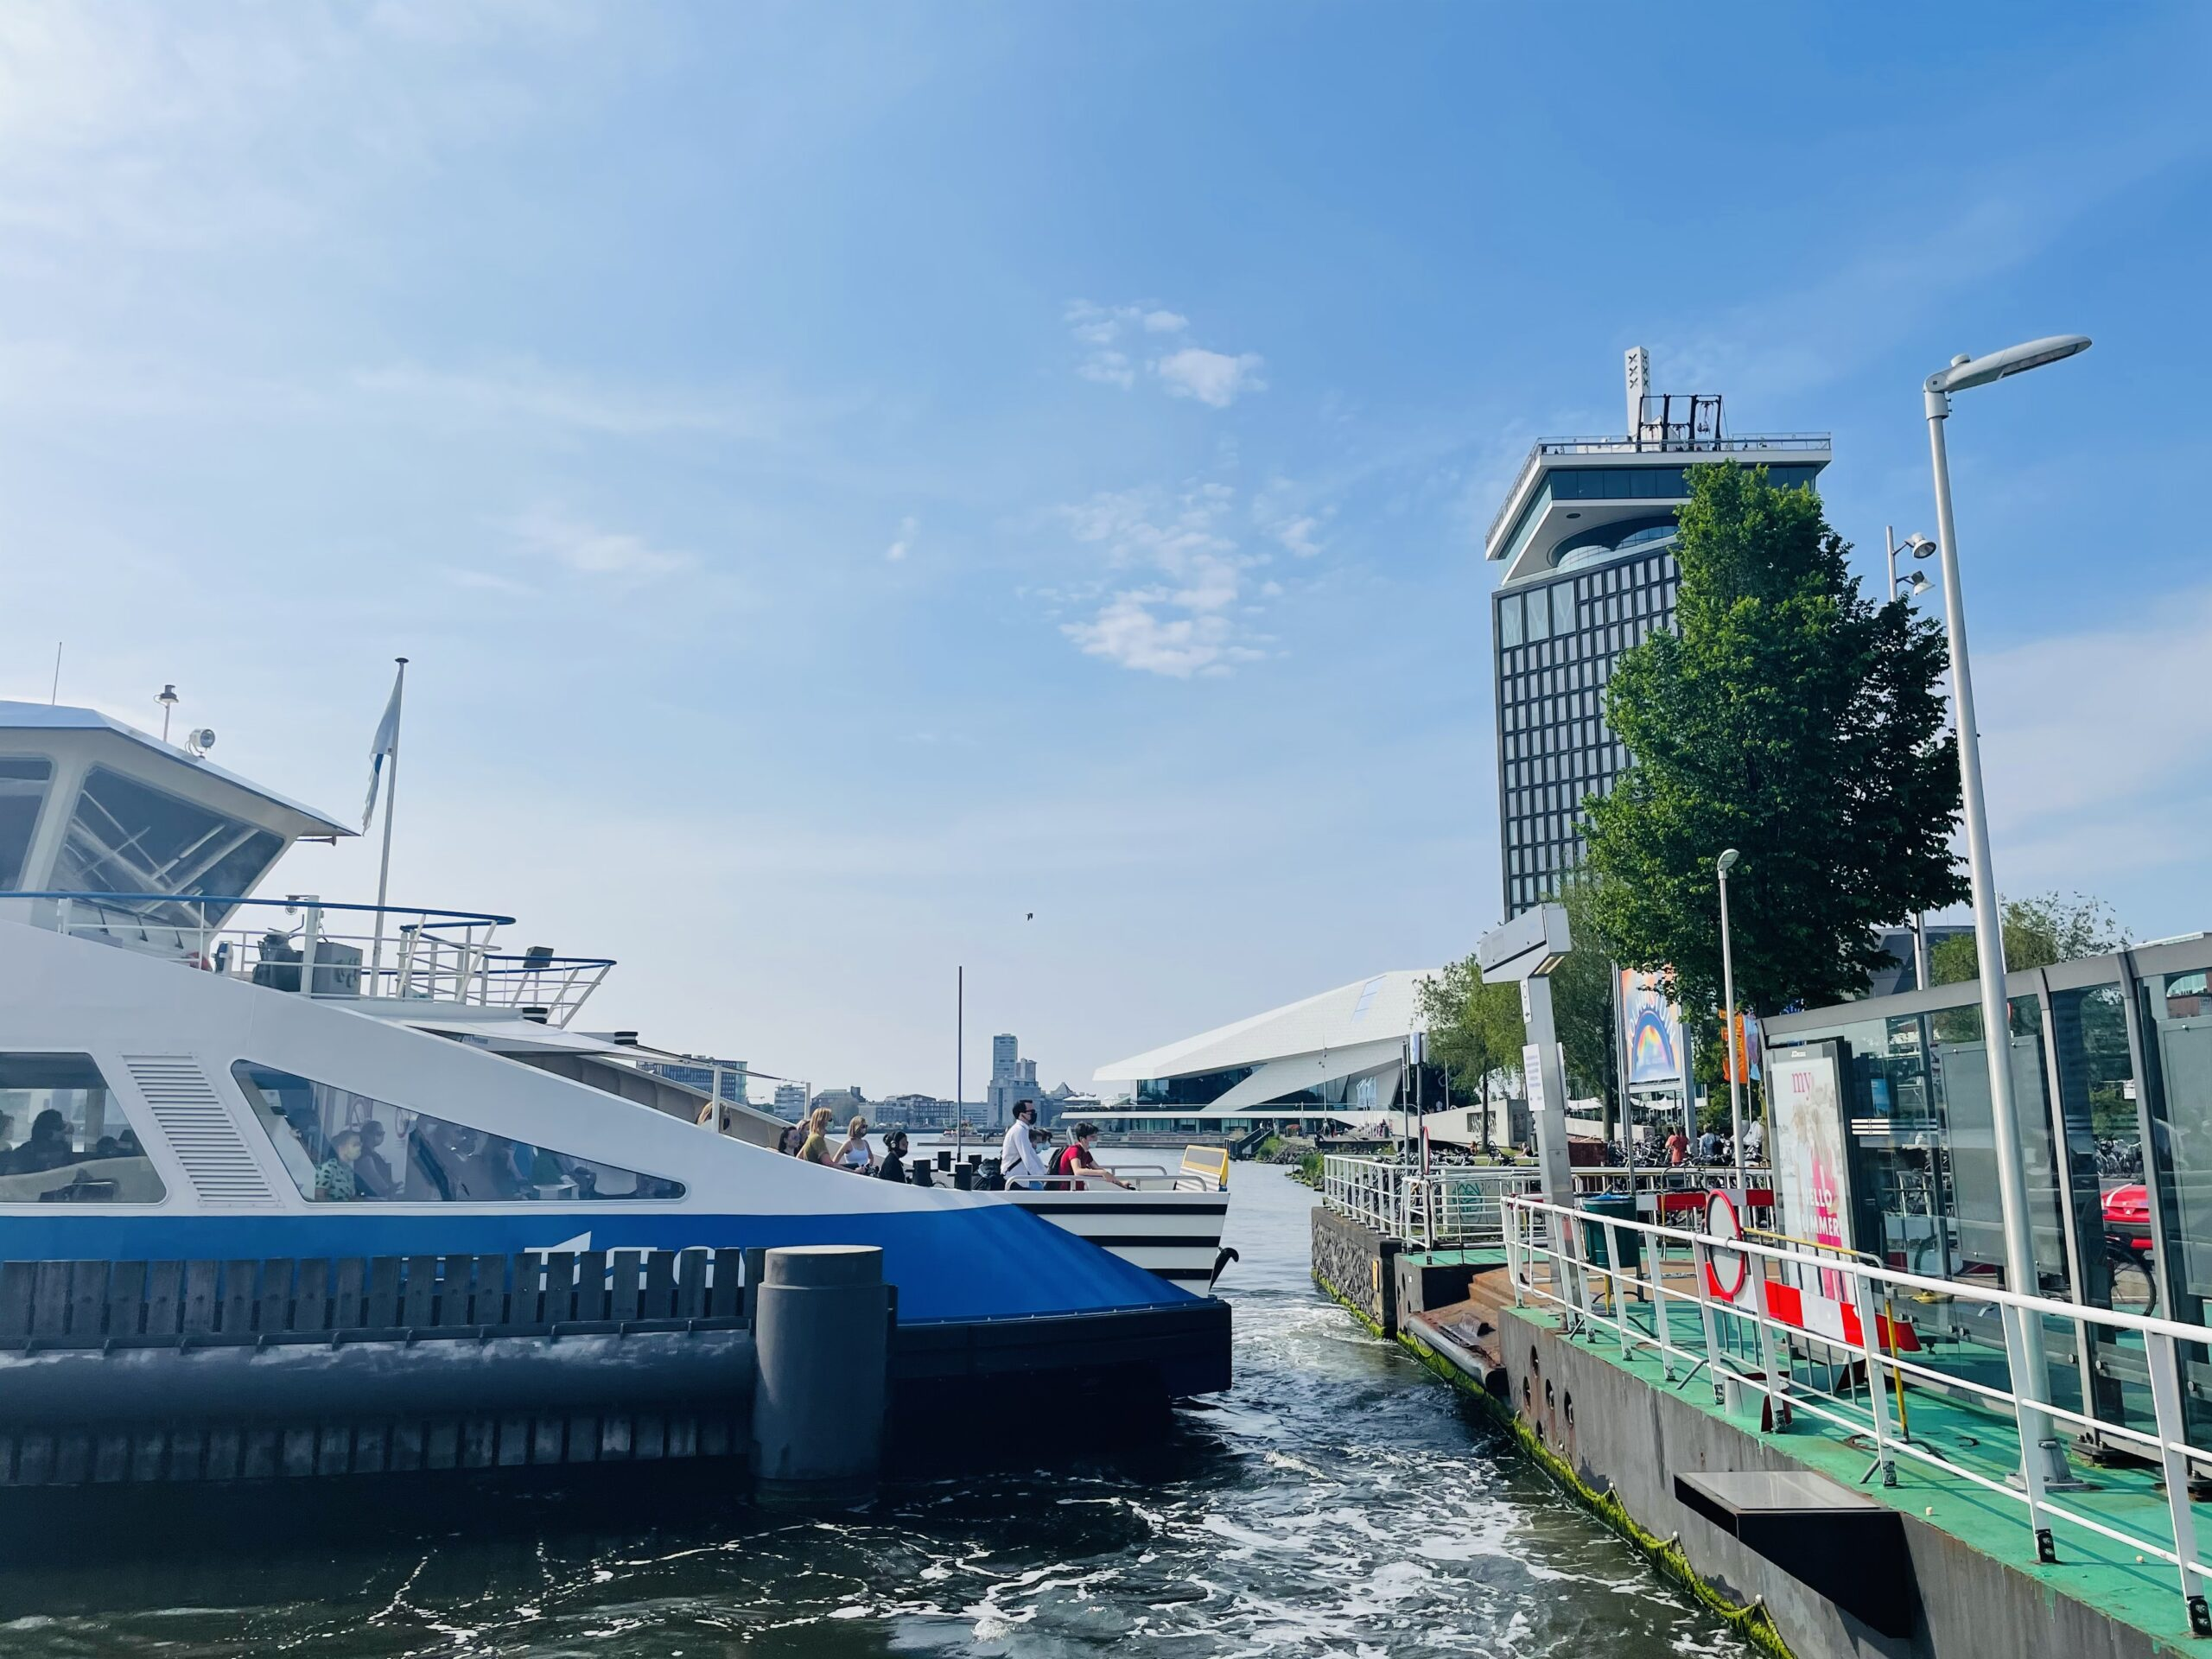 GVB Pont Vacatures Amsterdam